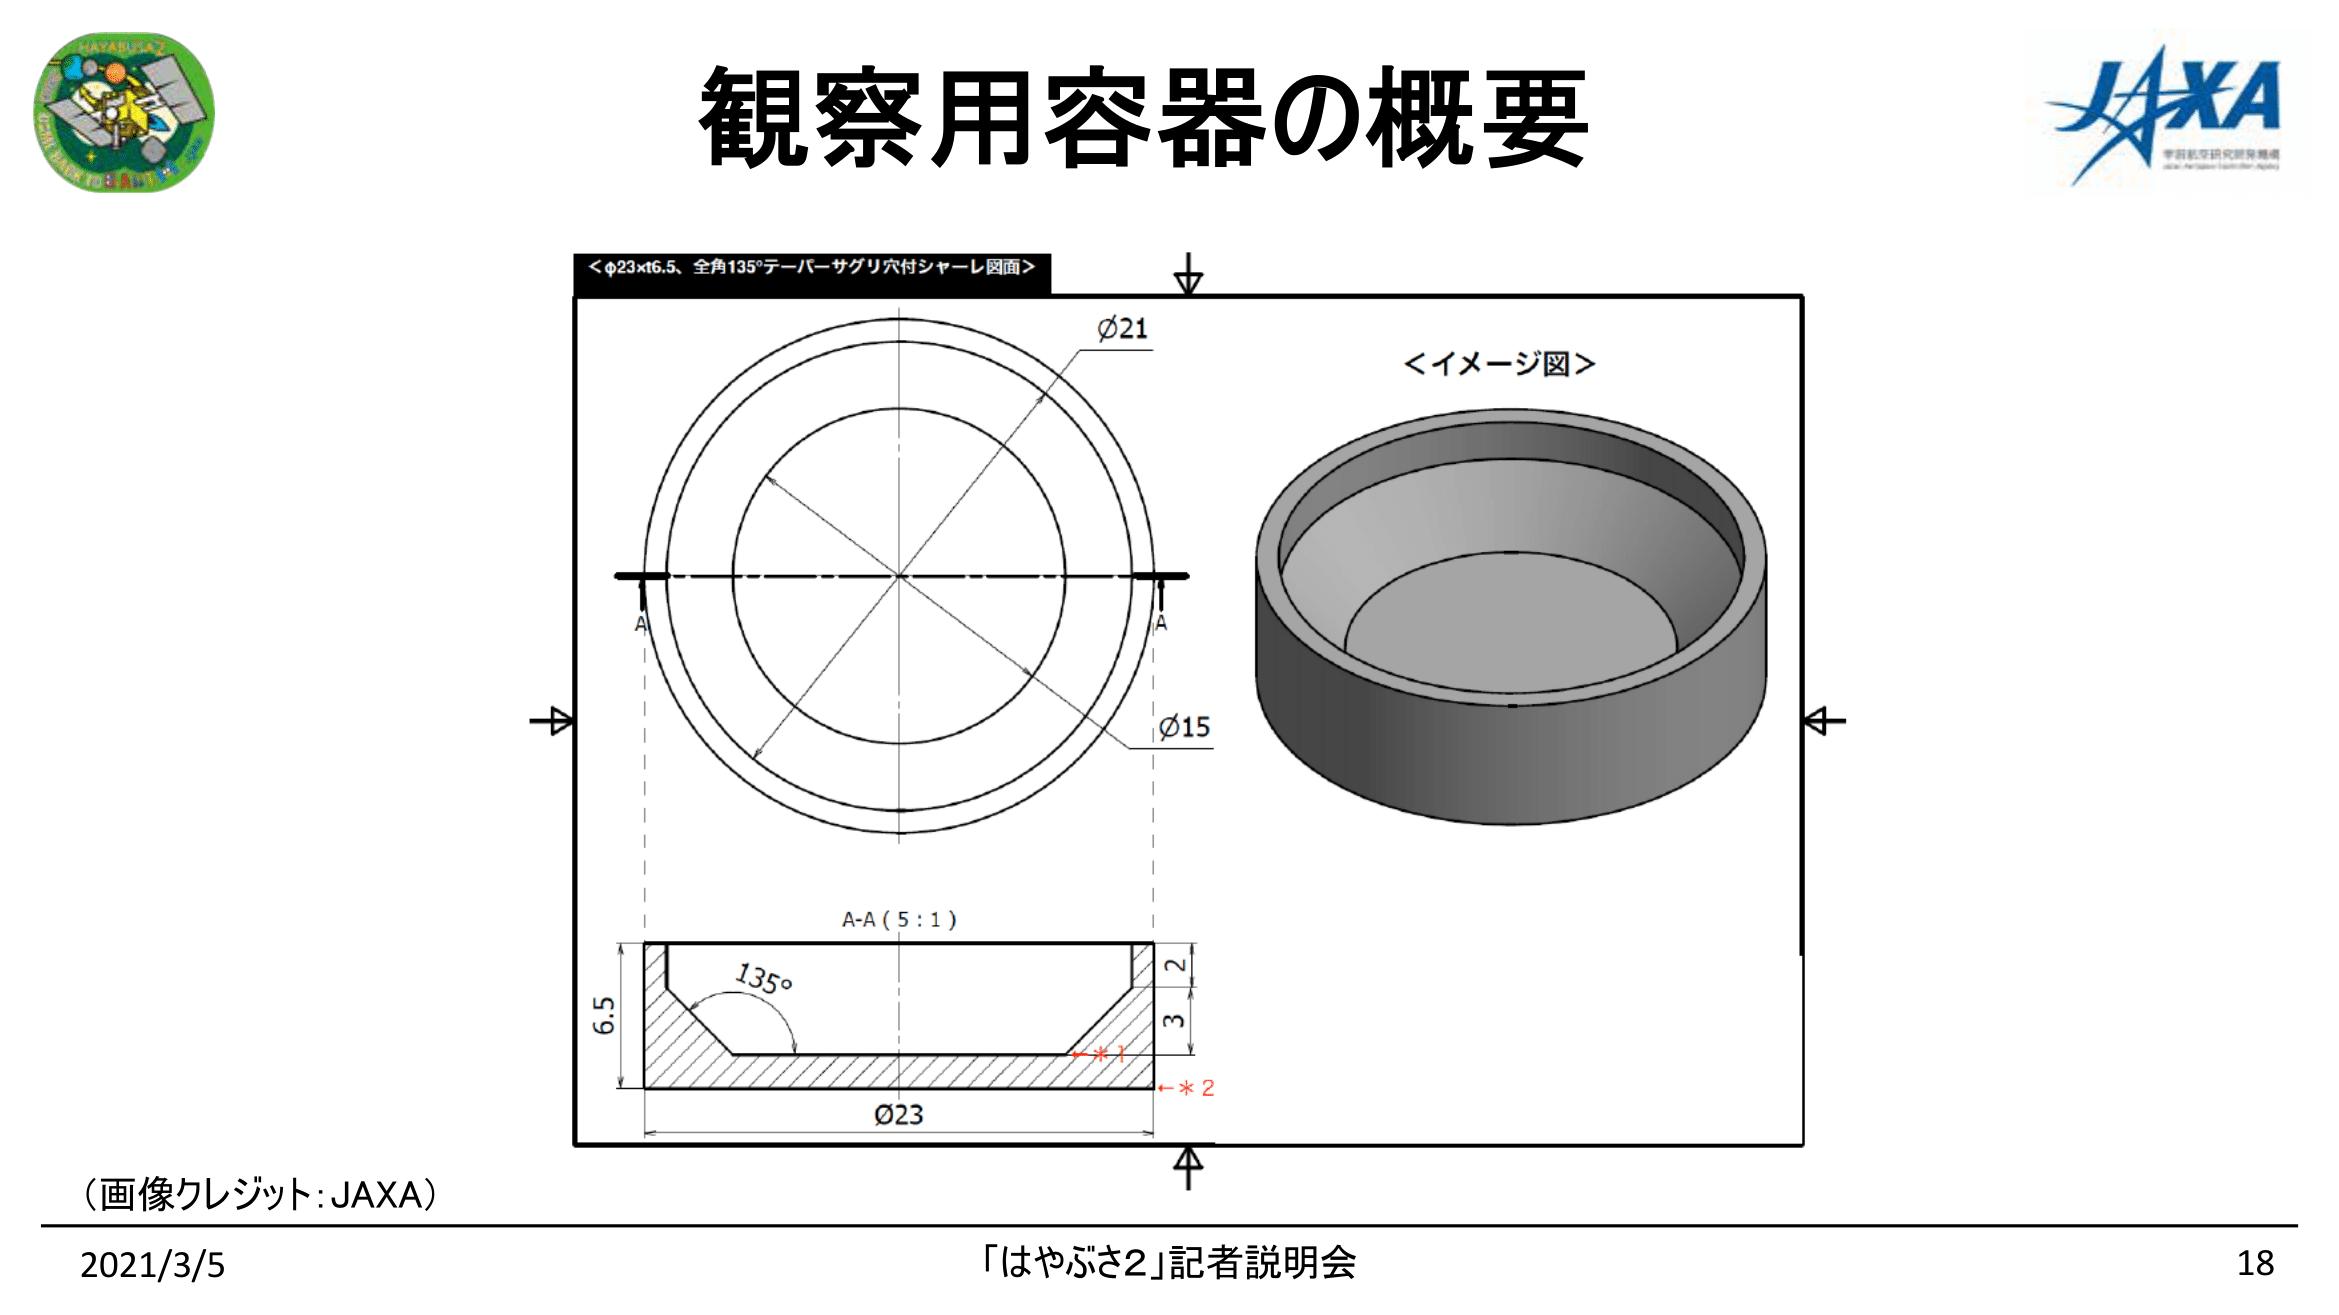 f:id:Imamura:20210305134315p:plain